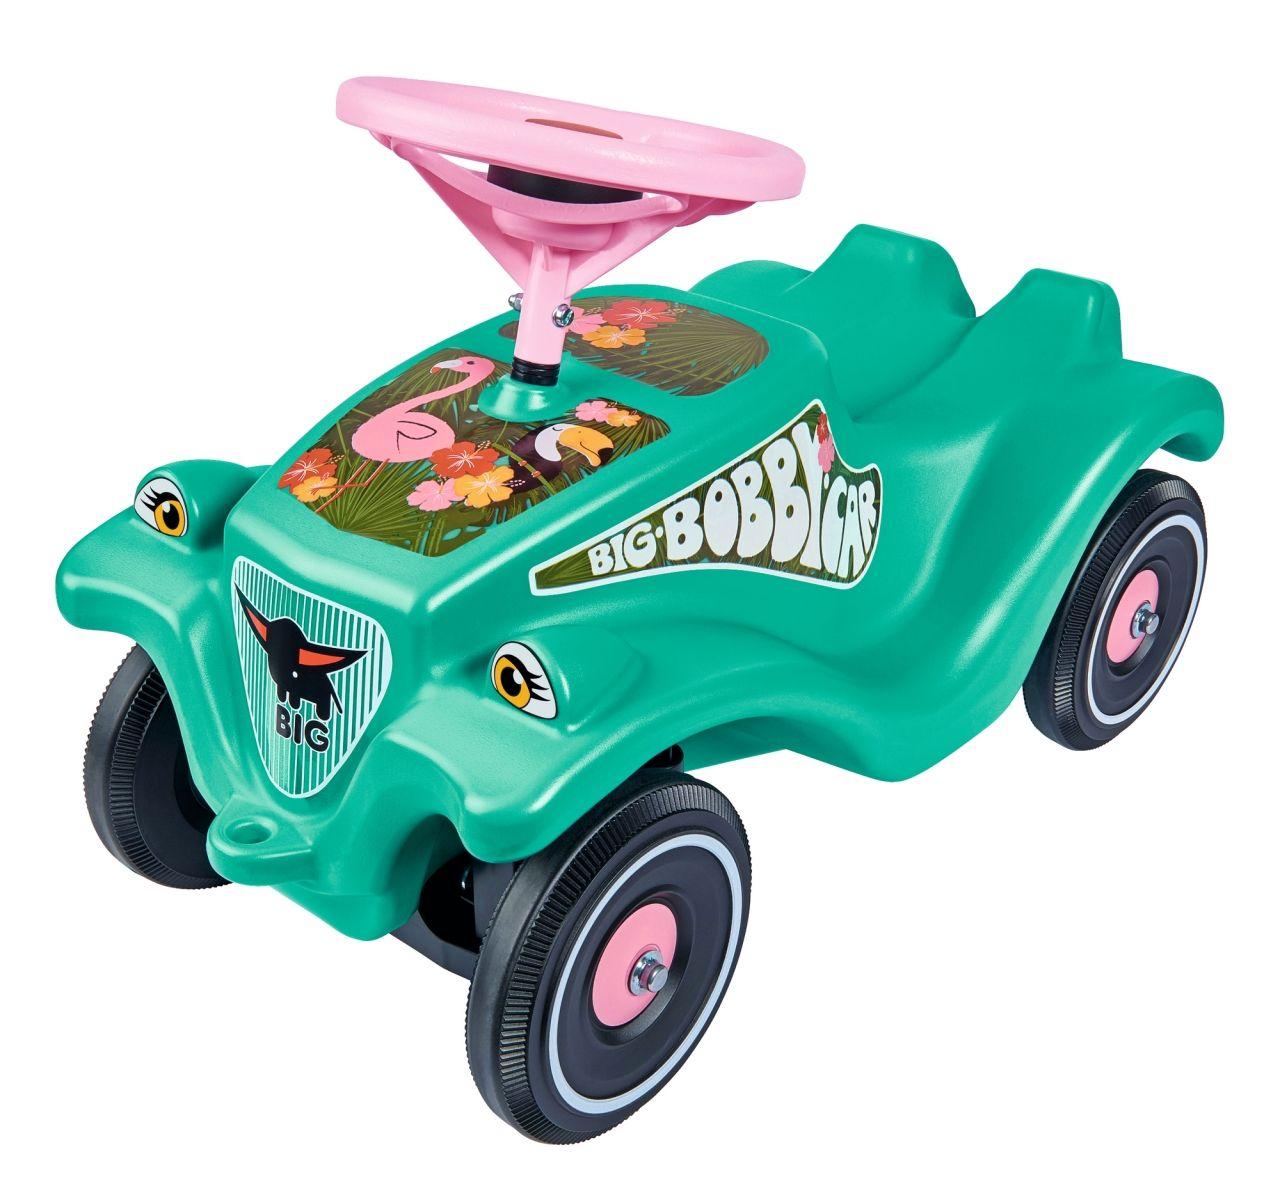 Каталка-толокар Bobby Car Classic - Тропический фламинго